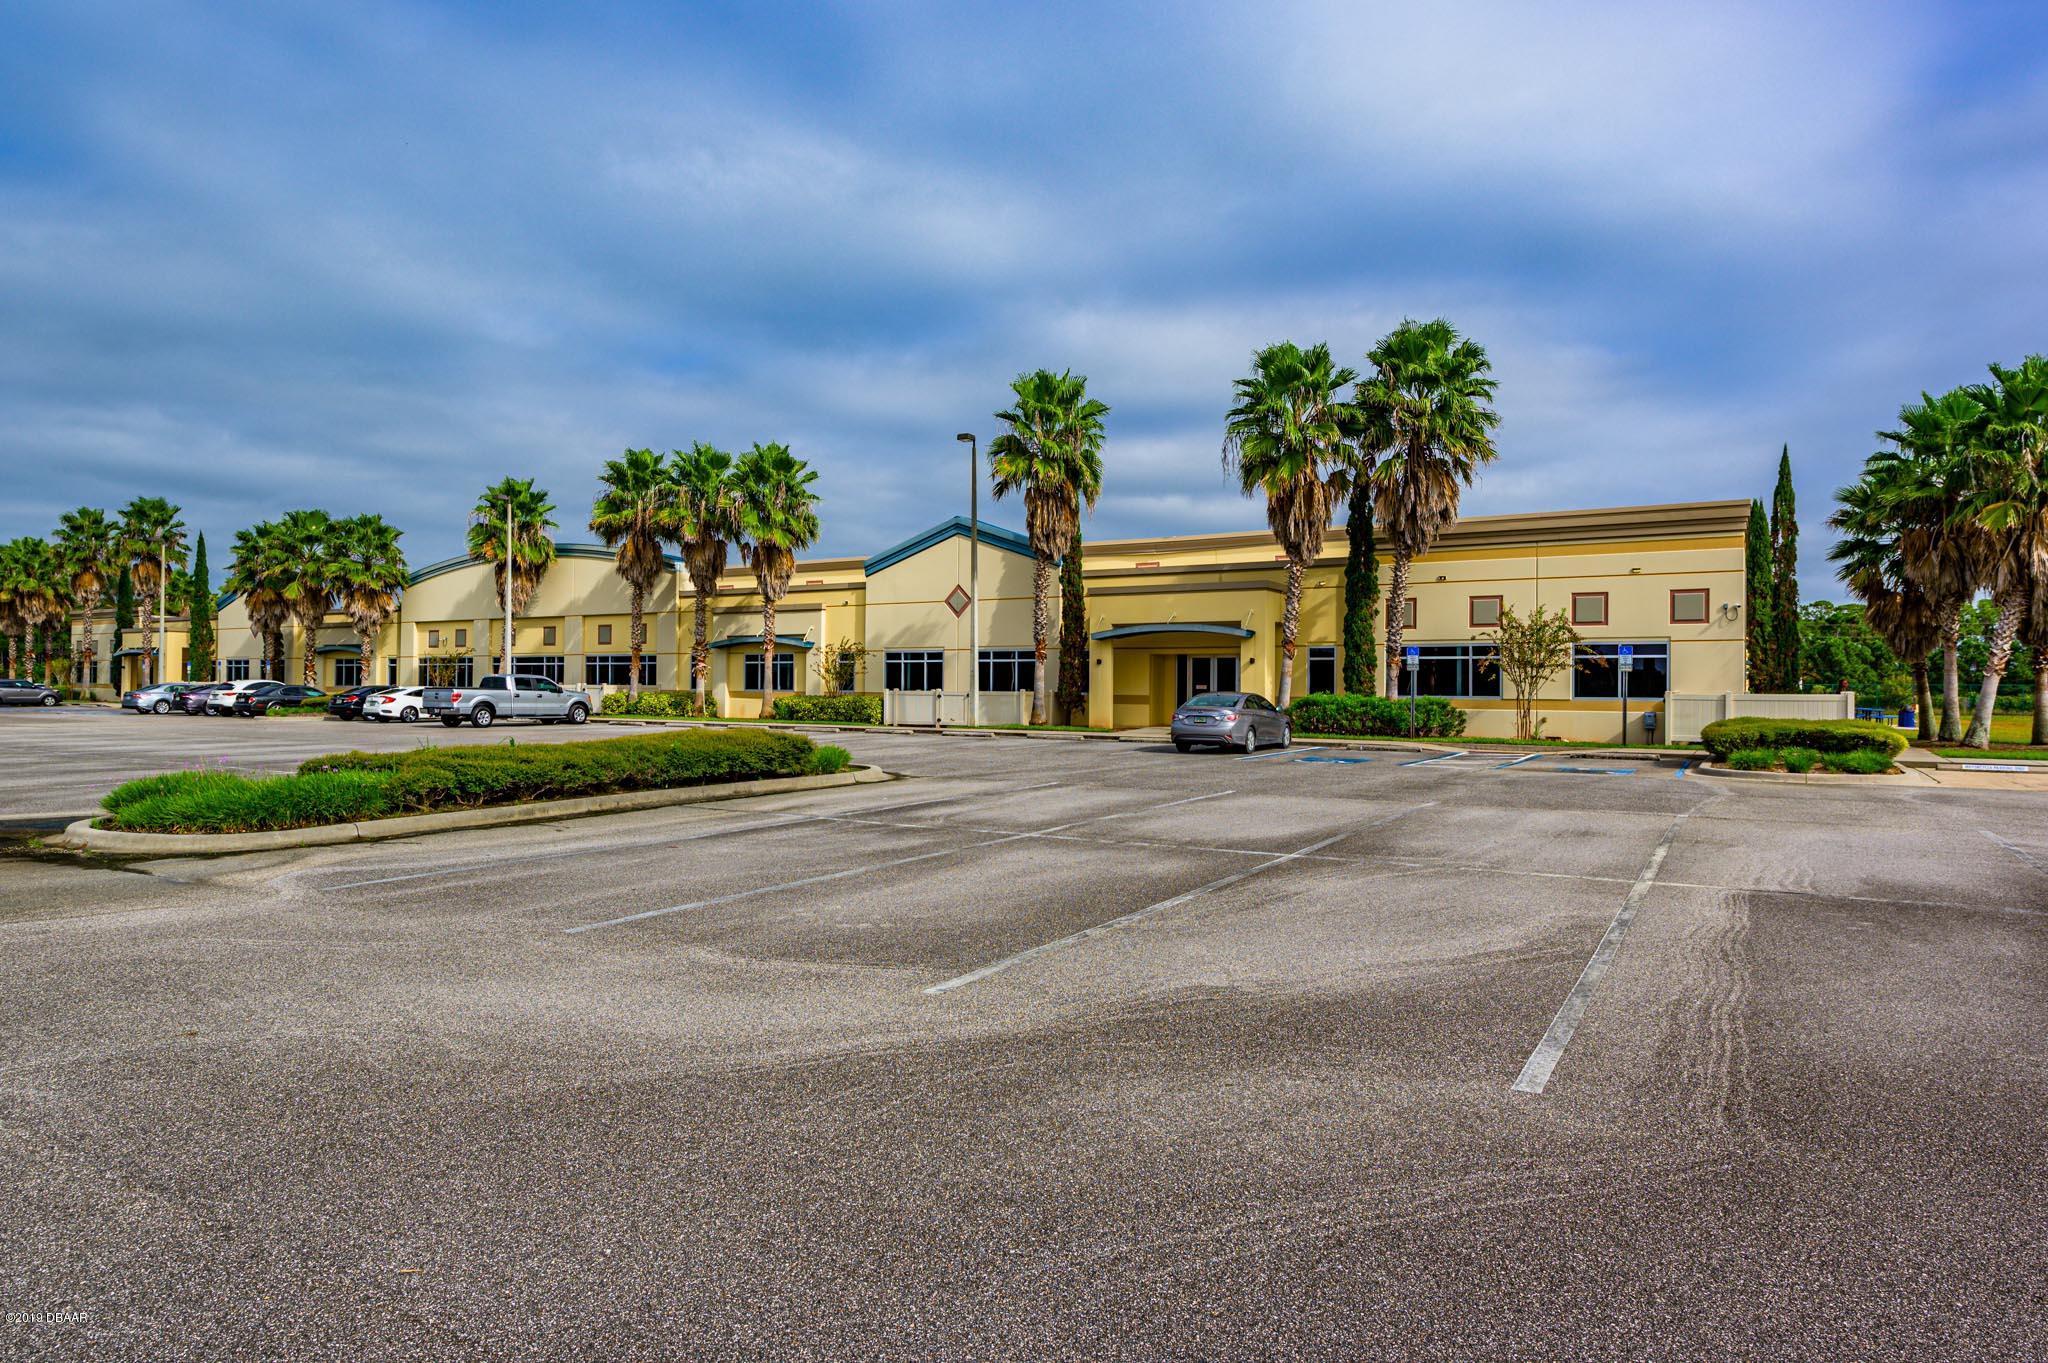 Photo of 1420 Hockney Court, Port Orange, FL 32128